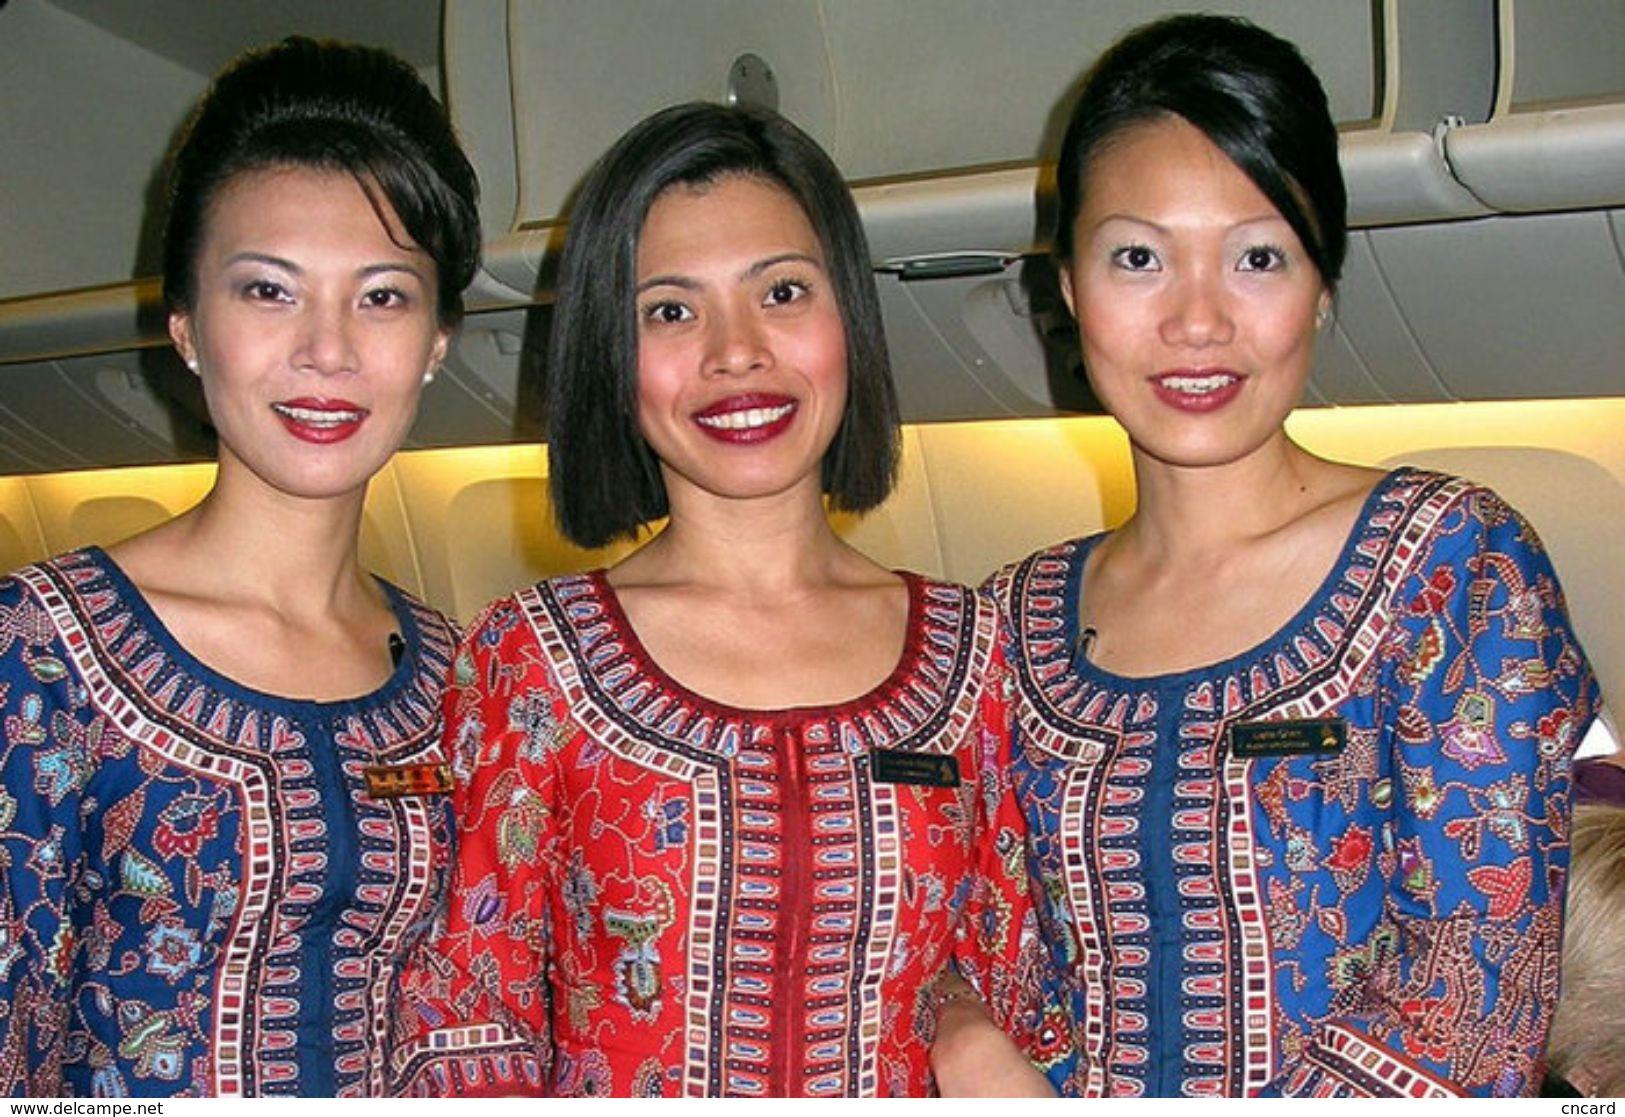 T80-094  ]  Flight Attendants Air Attendants Stewardesses Hostesses Cabin Crew , China Pre-paid Card, Postal Stationery - Jobs